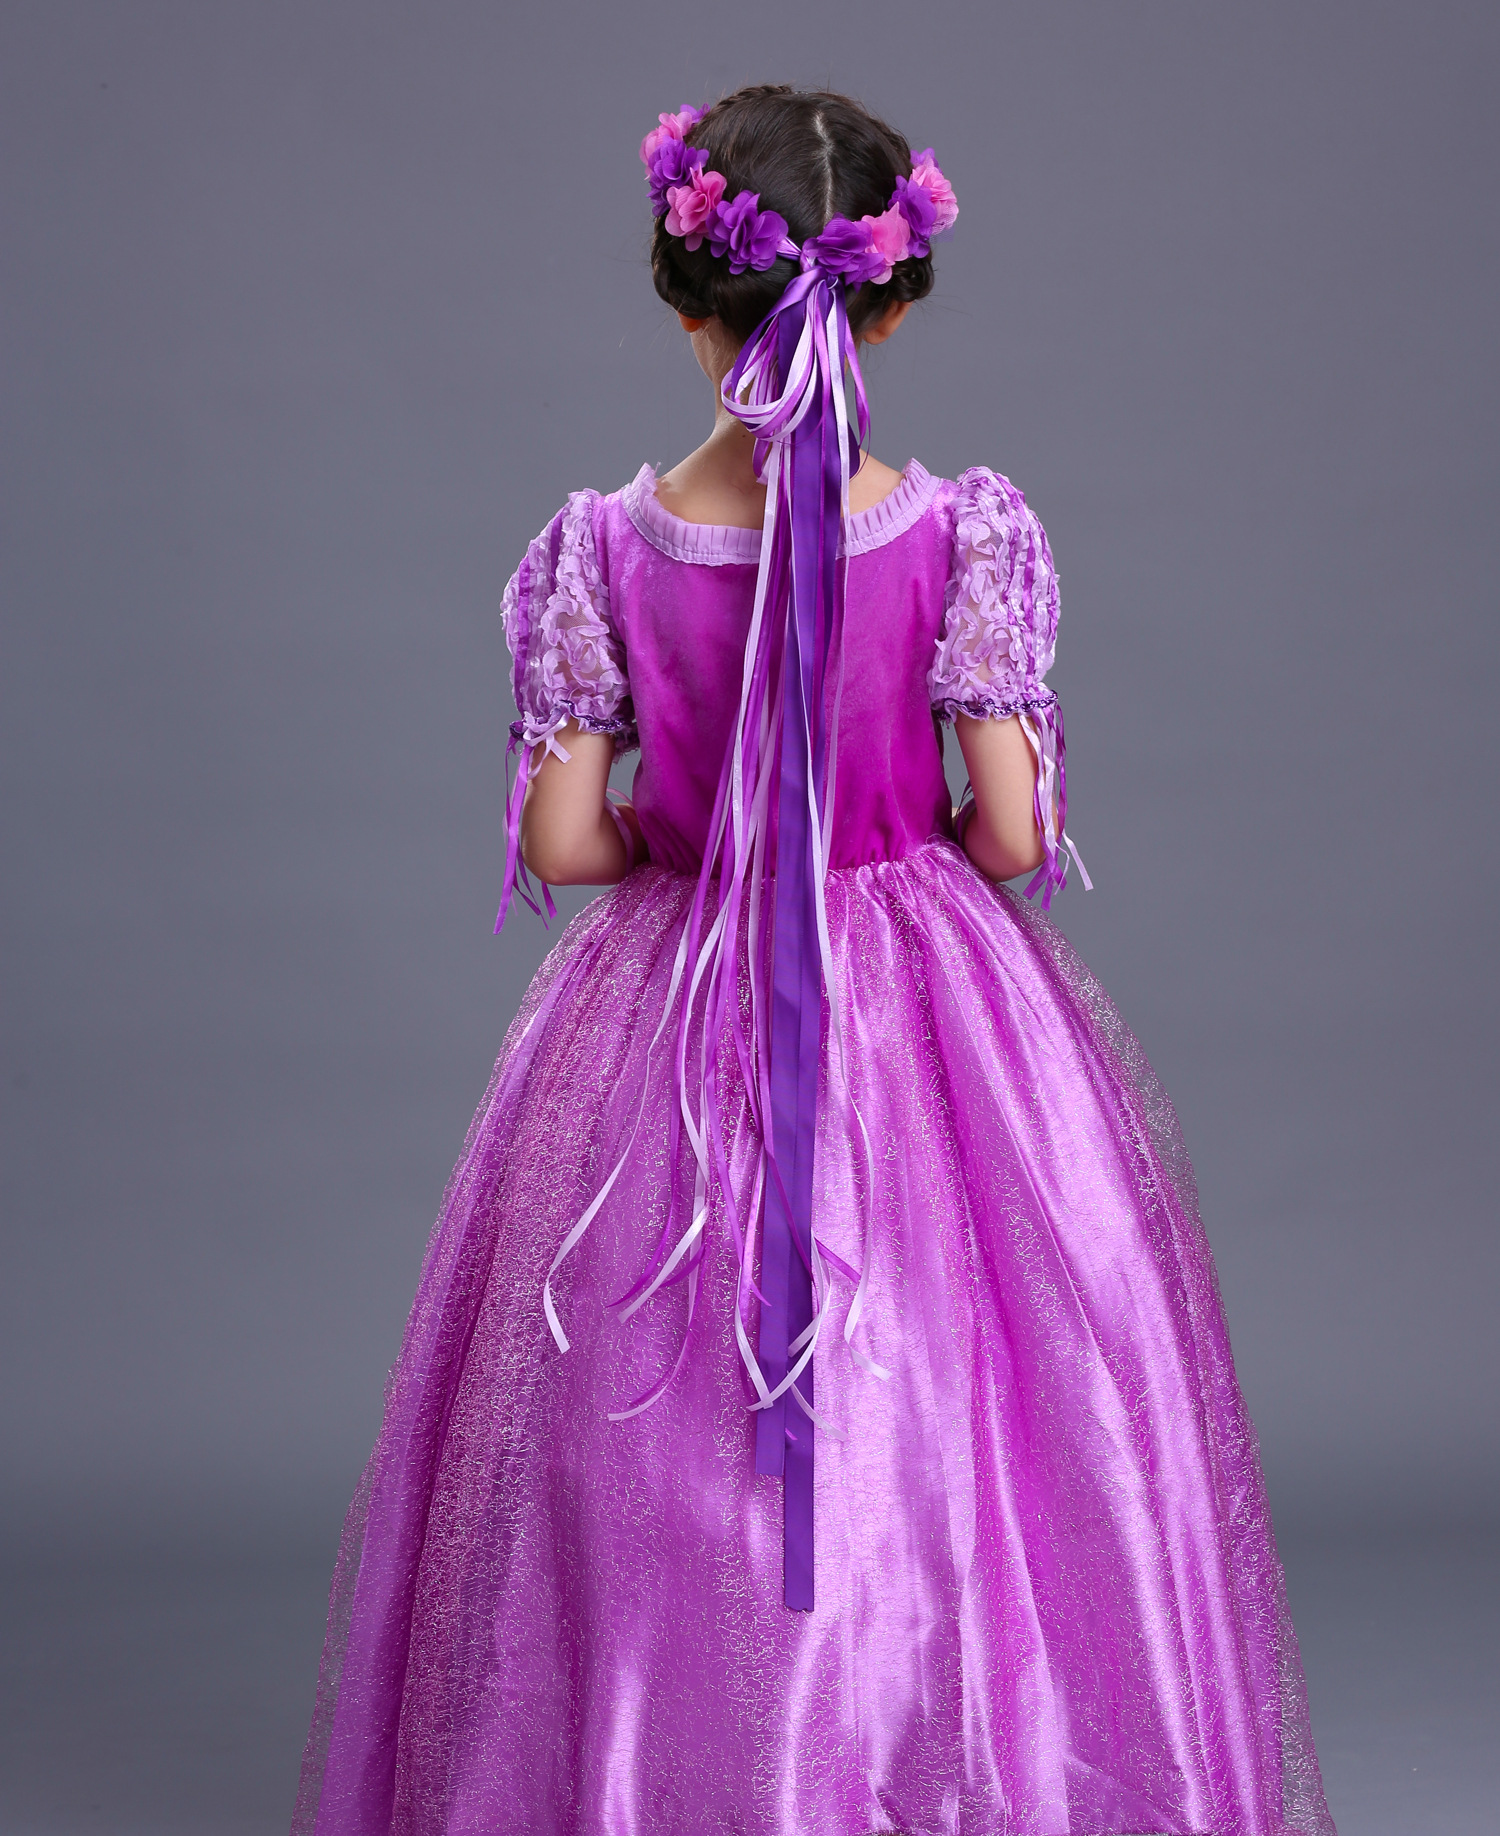 Aliexpress.com : Buy Halloween Kids Clothes Children\'s Costumes ...